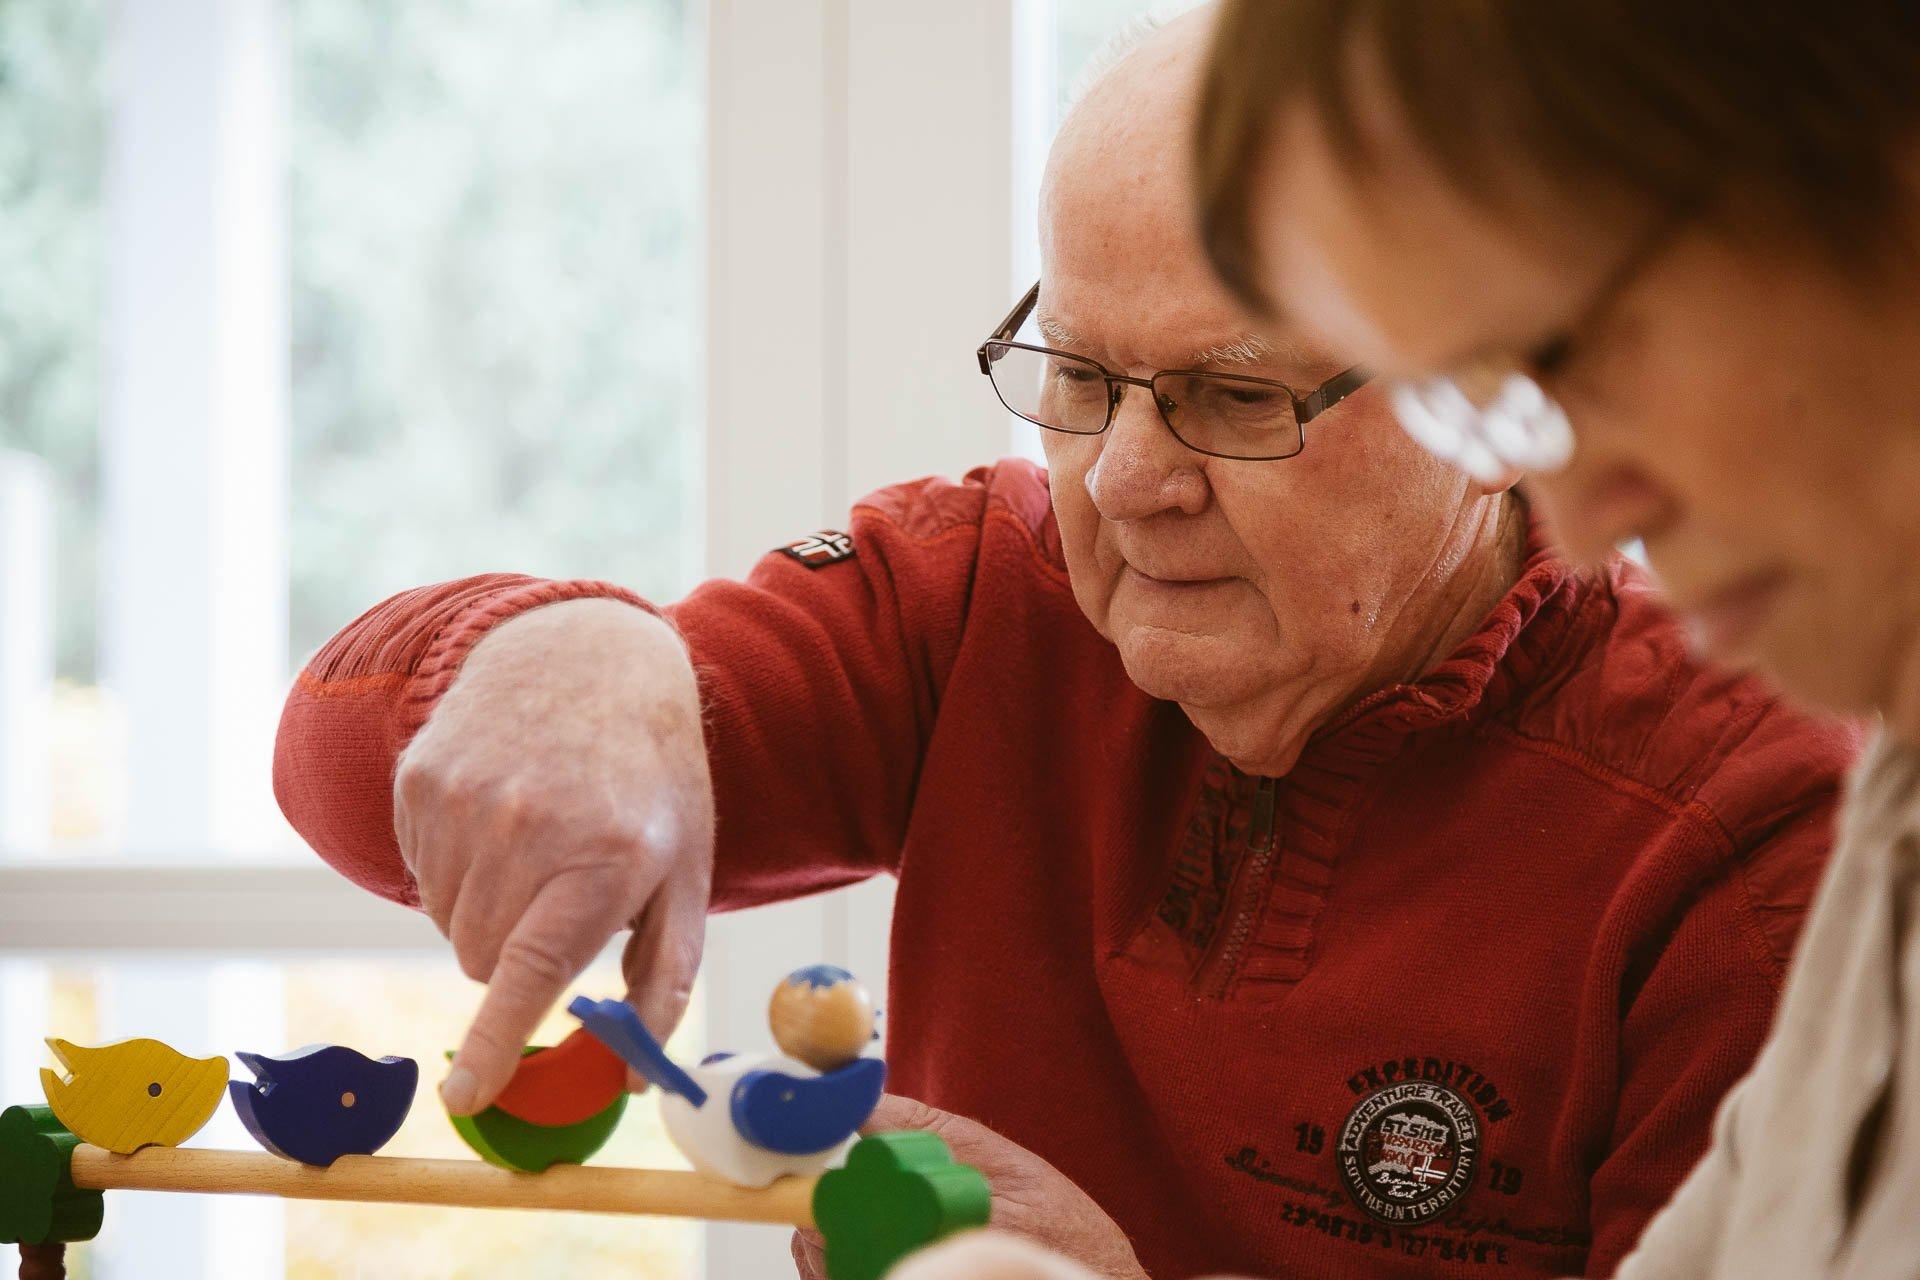 Behindertenbetreuung in Zeitz